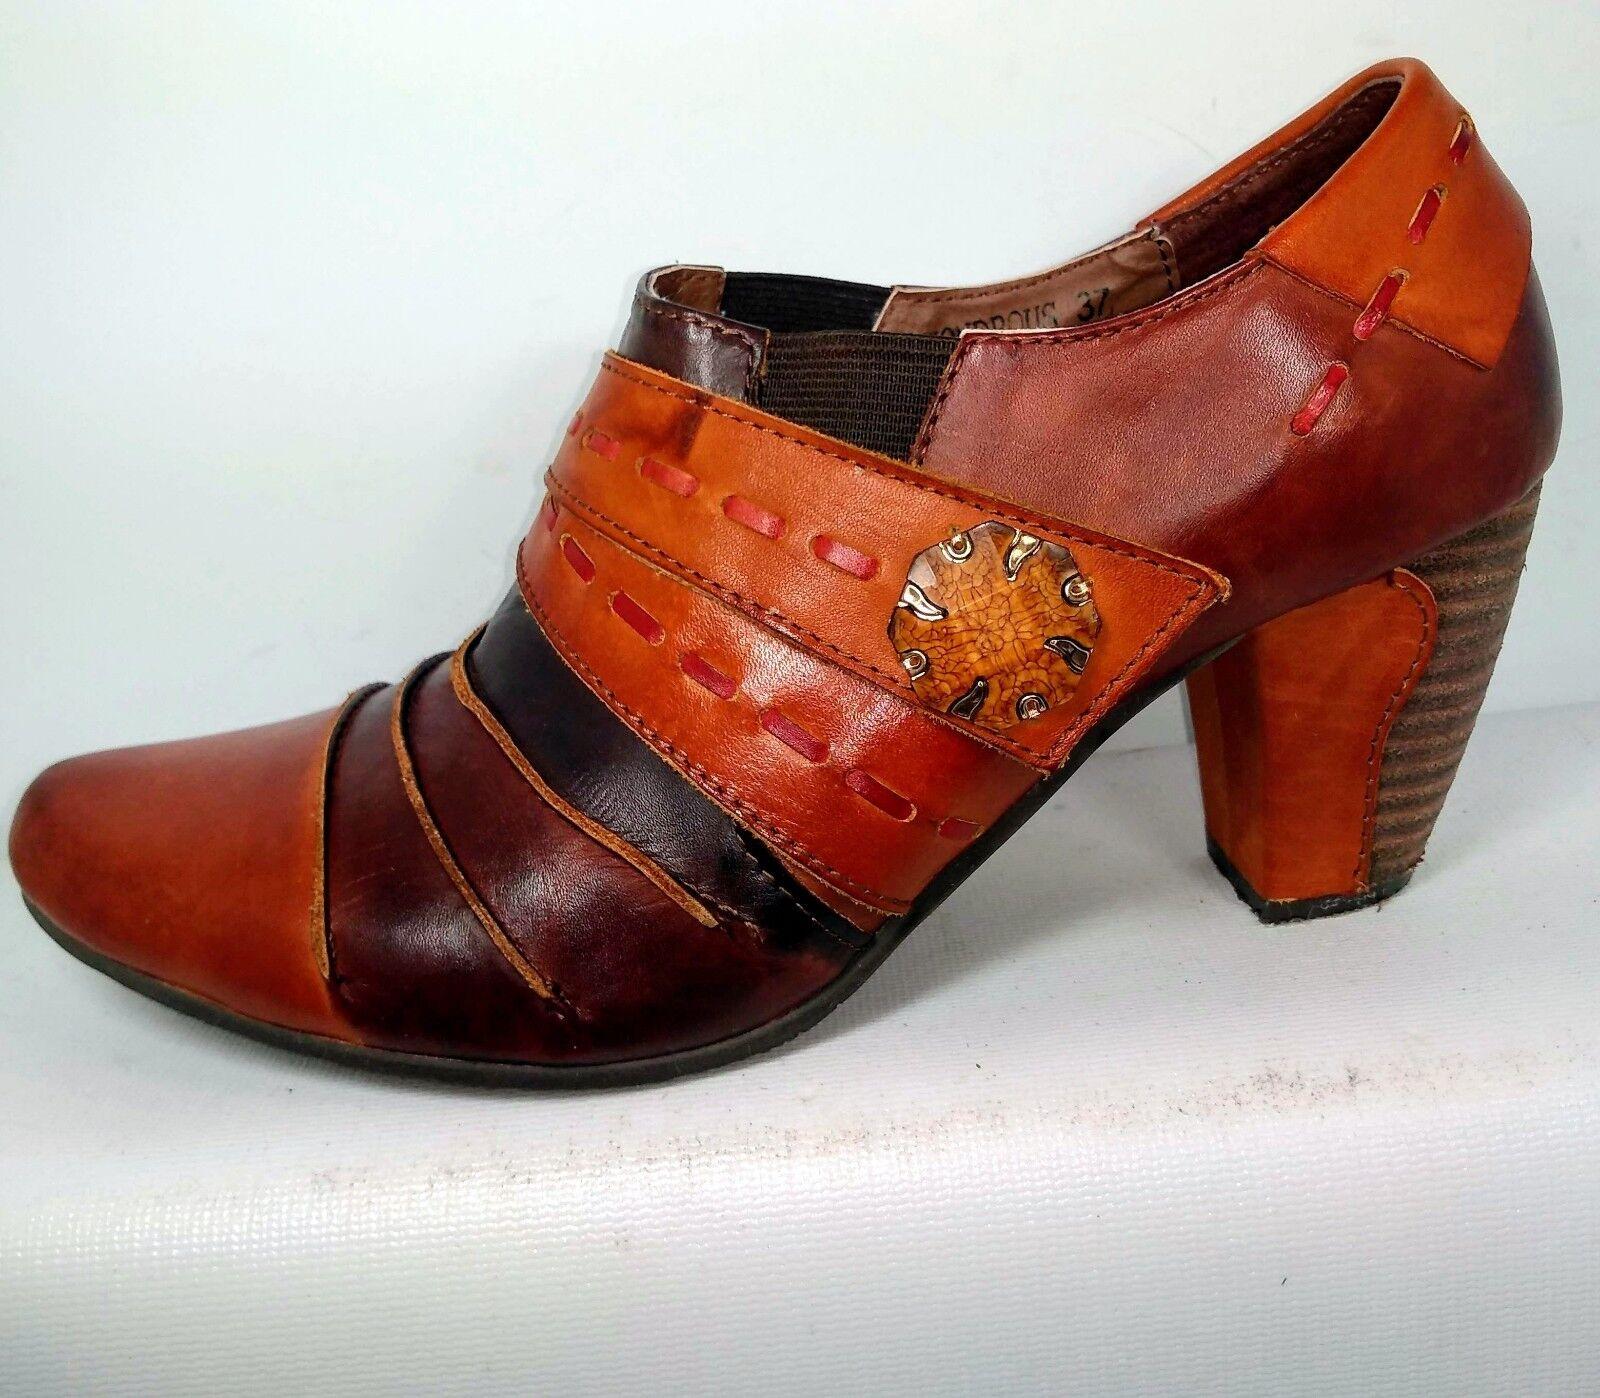 Spring Step Wondrous Brown Leather Bootie Women US 6.5   7 EU 37 Minimal Wear